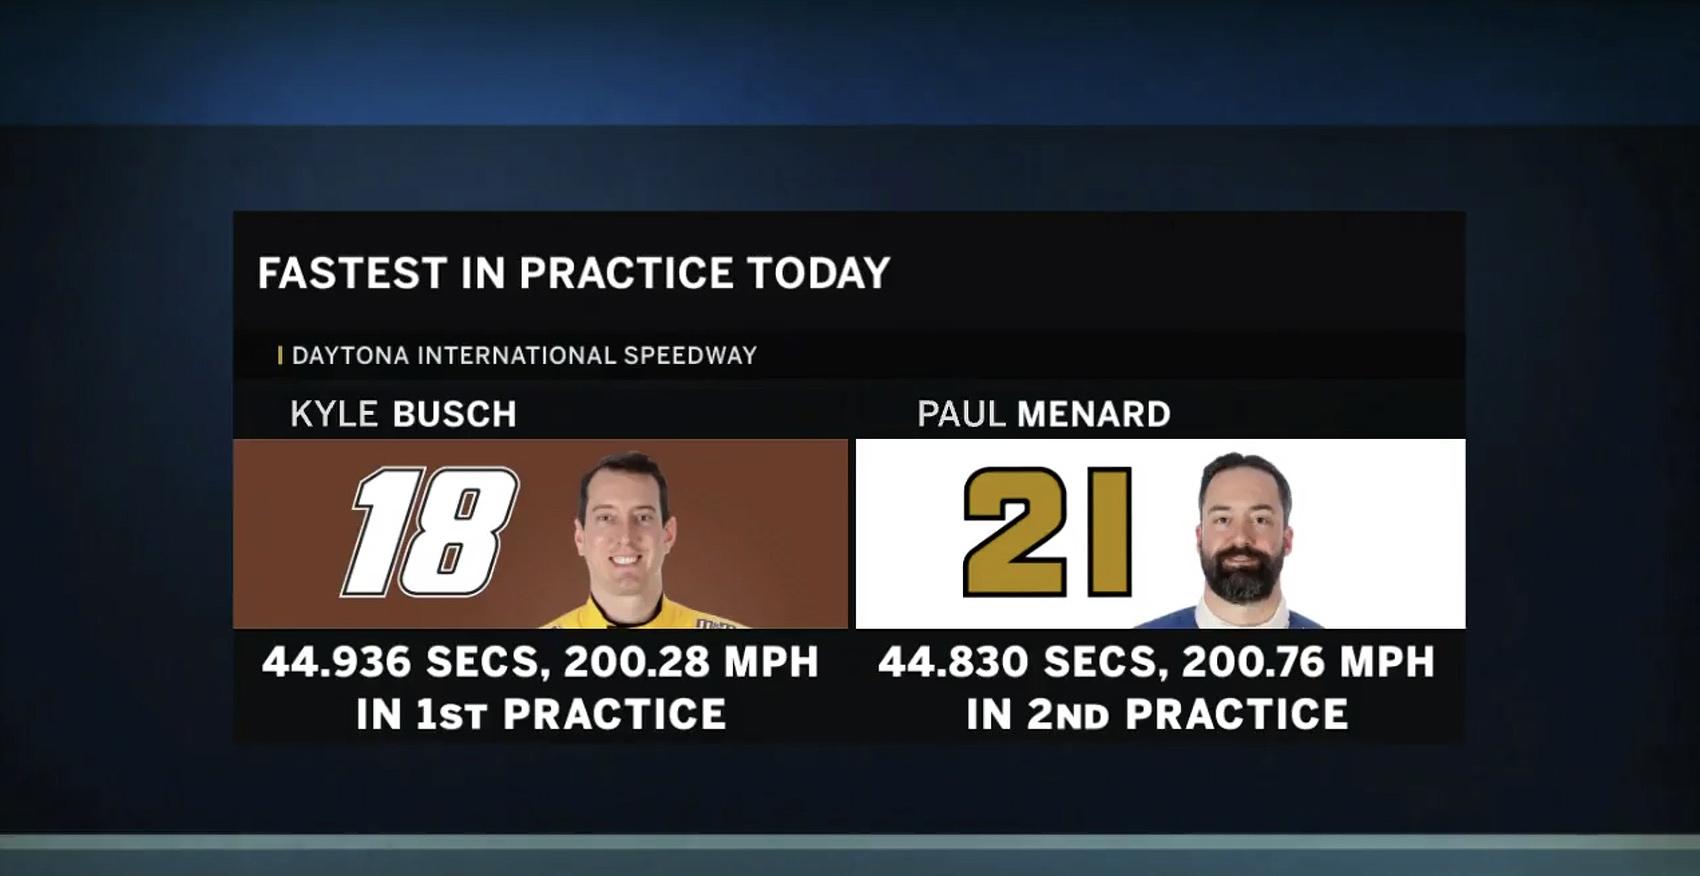 NCS_NASCAR-Fox-2019-Broadcast-Design_007